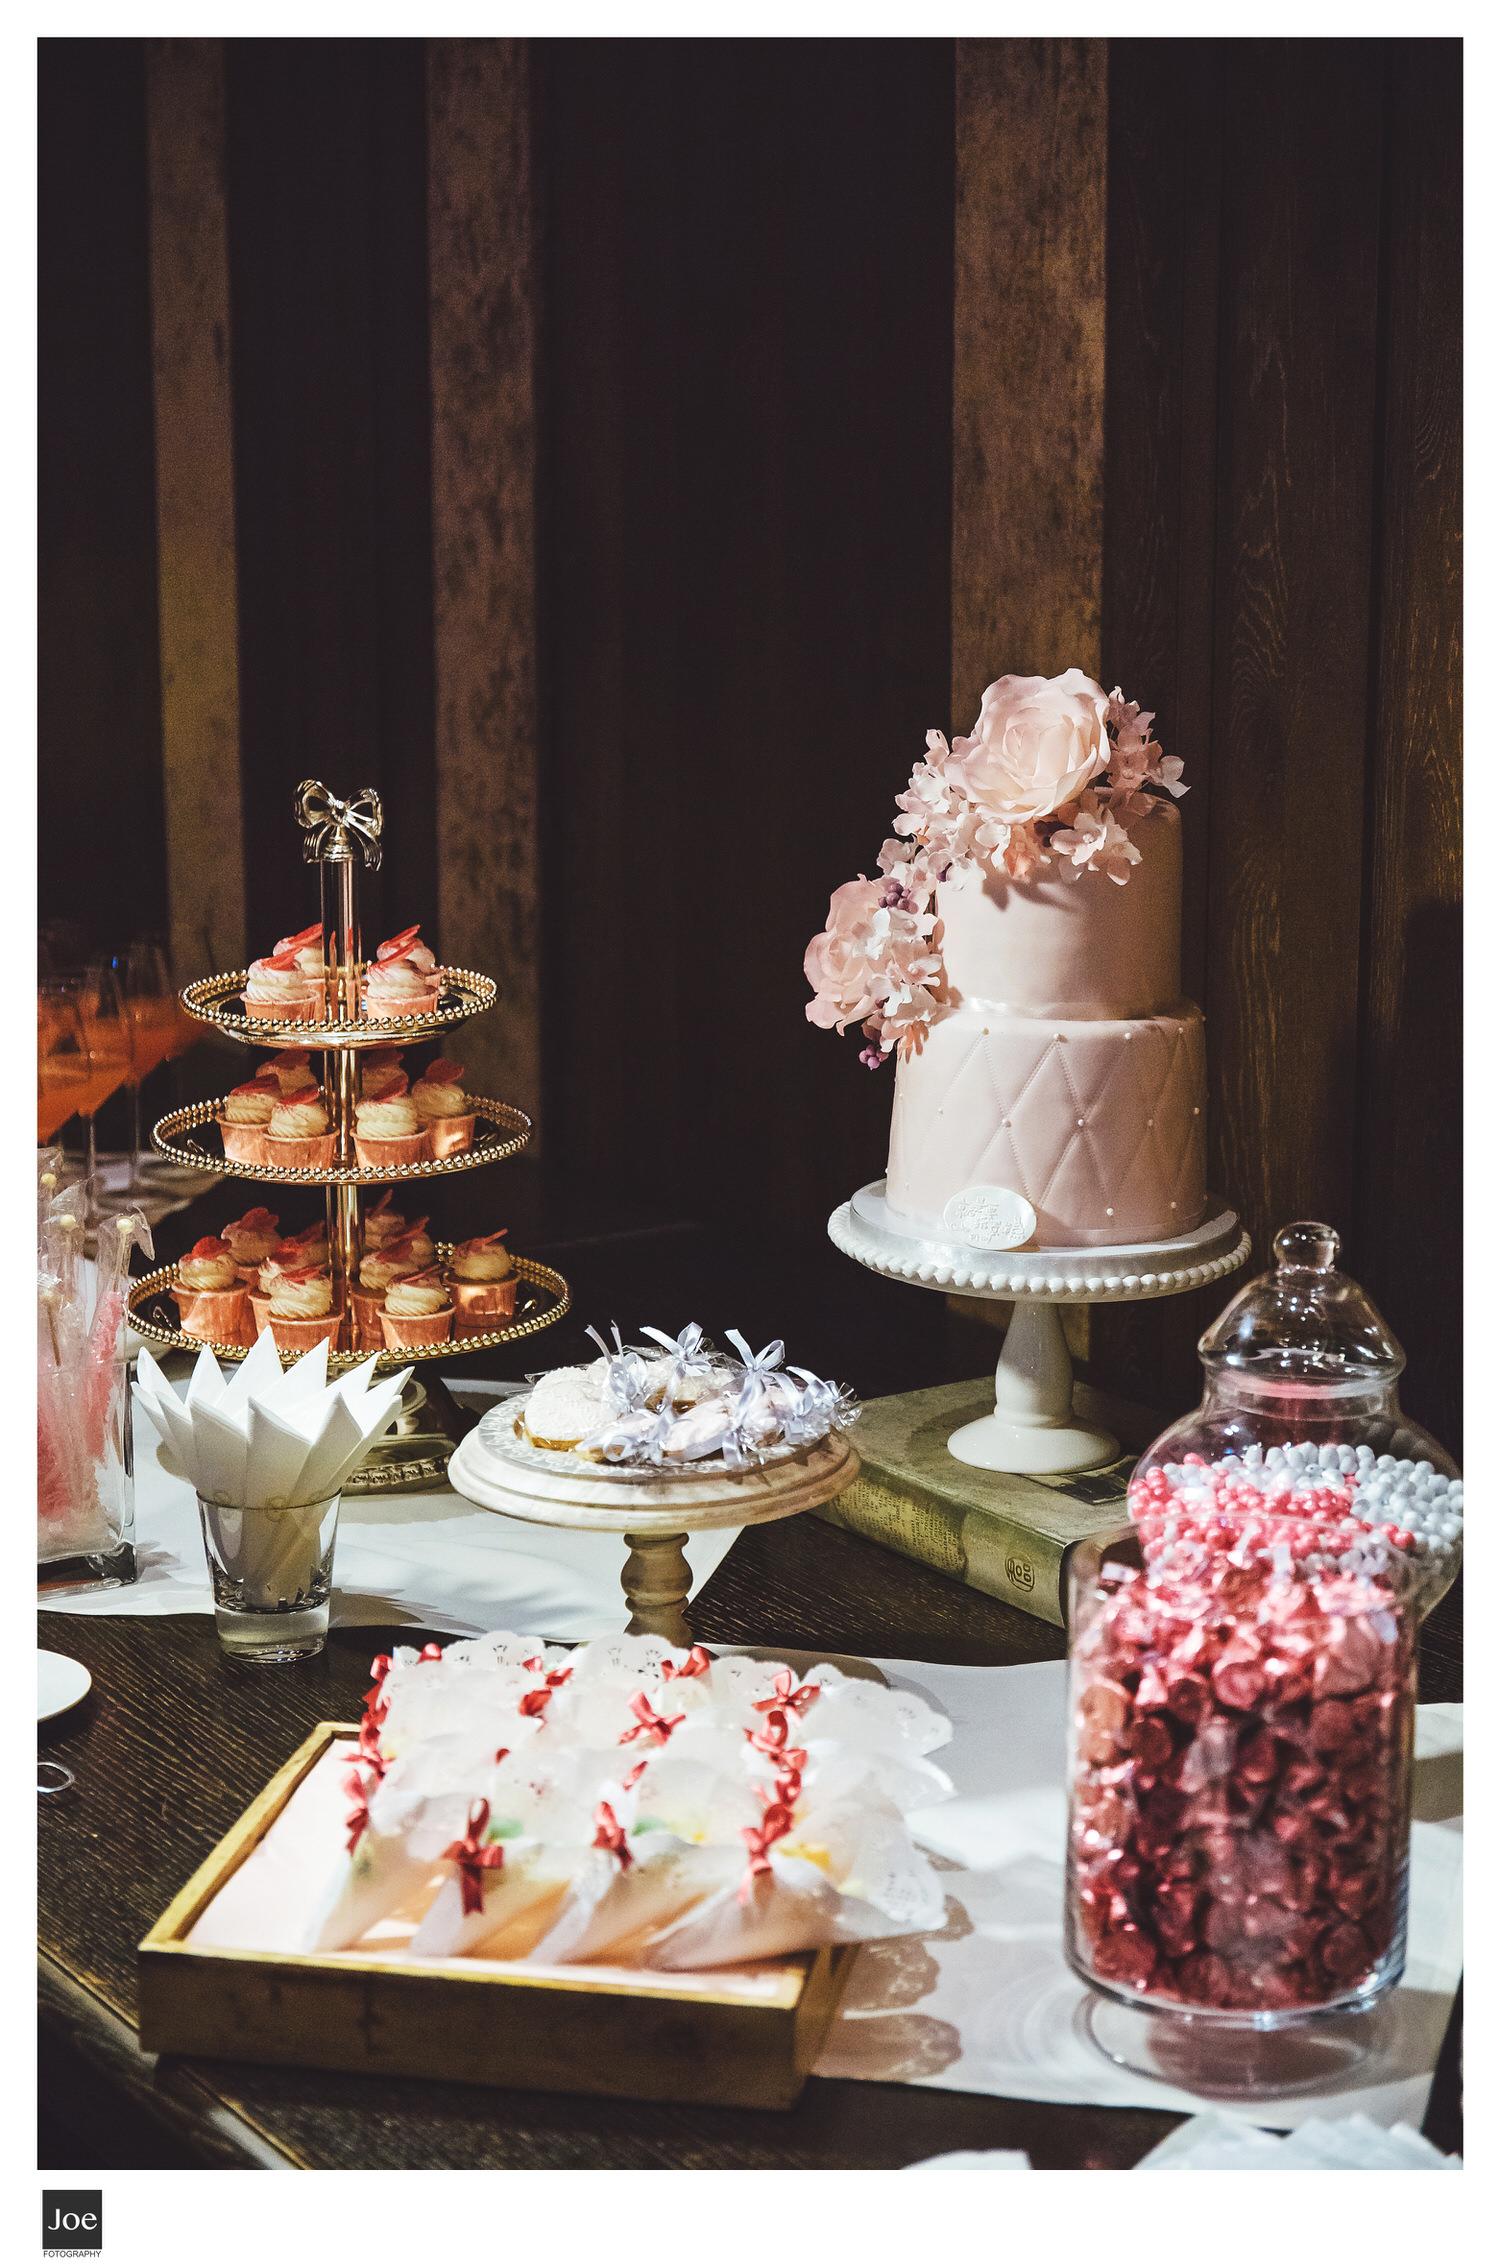 joe-fotography-wedding-palais-de-chine-hotel-14.jpg